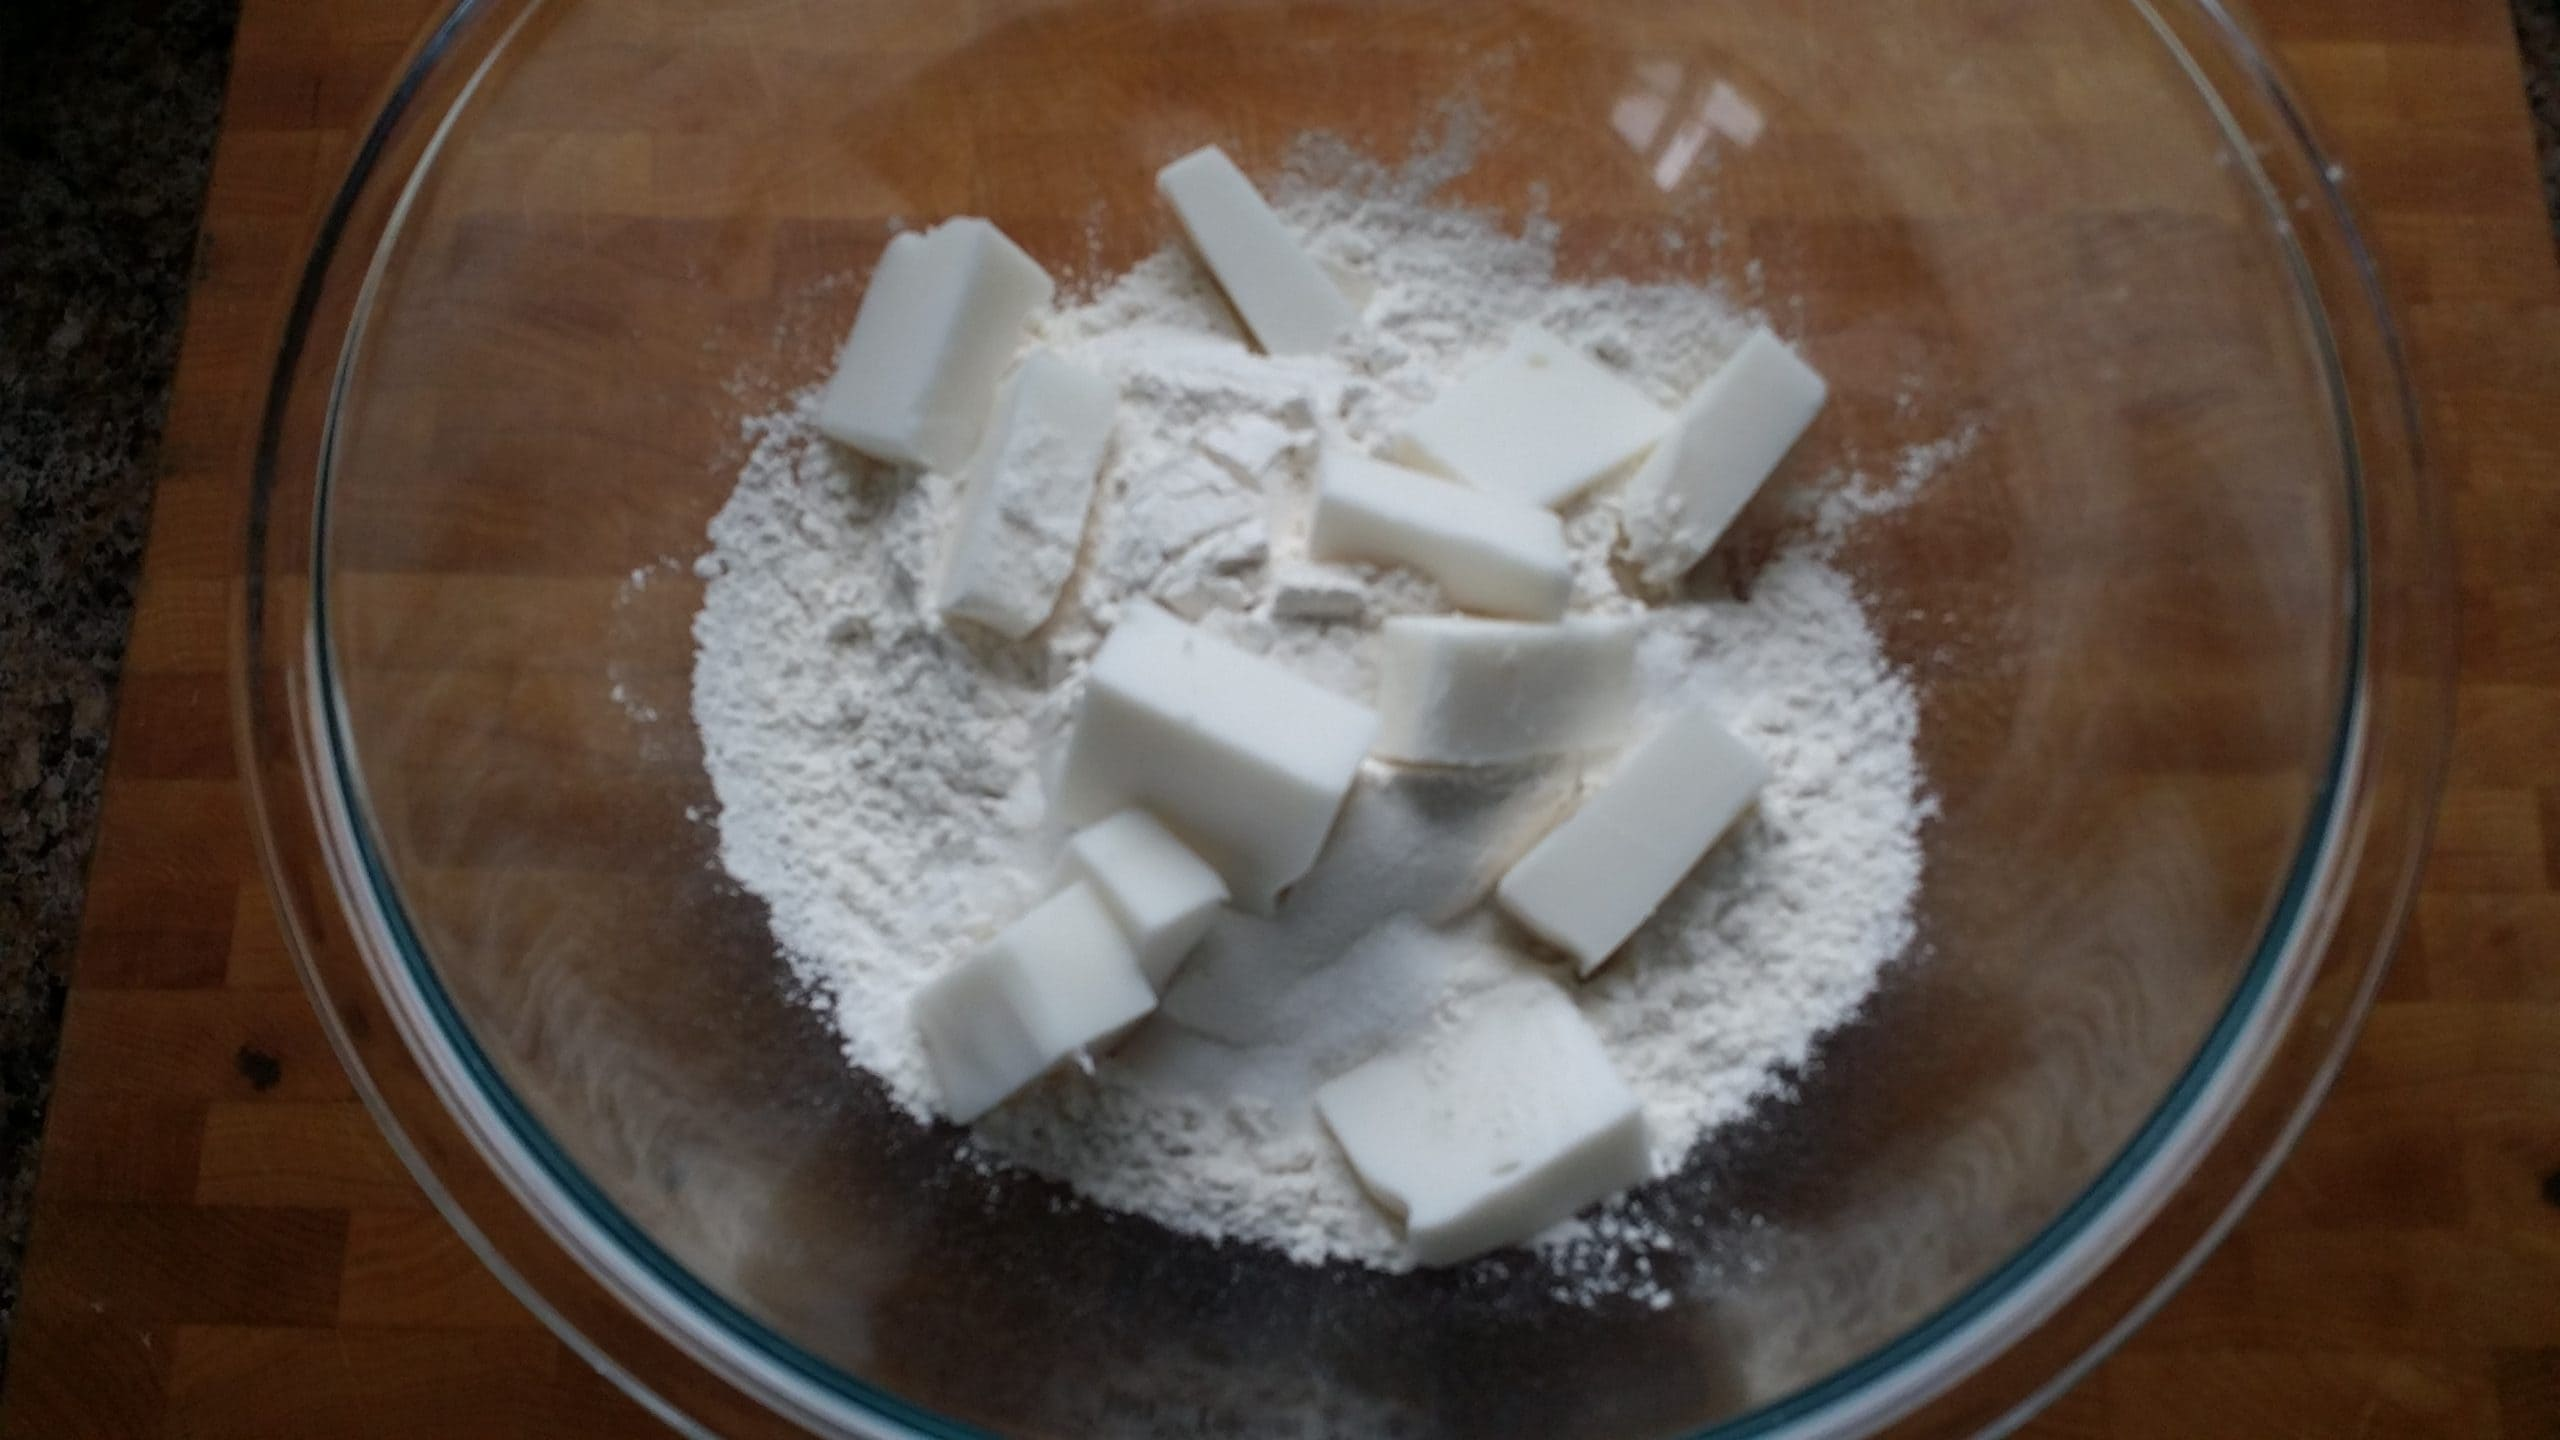 shortening in a bowl of flour, sugar and salt.